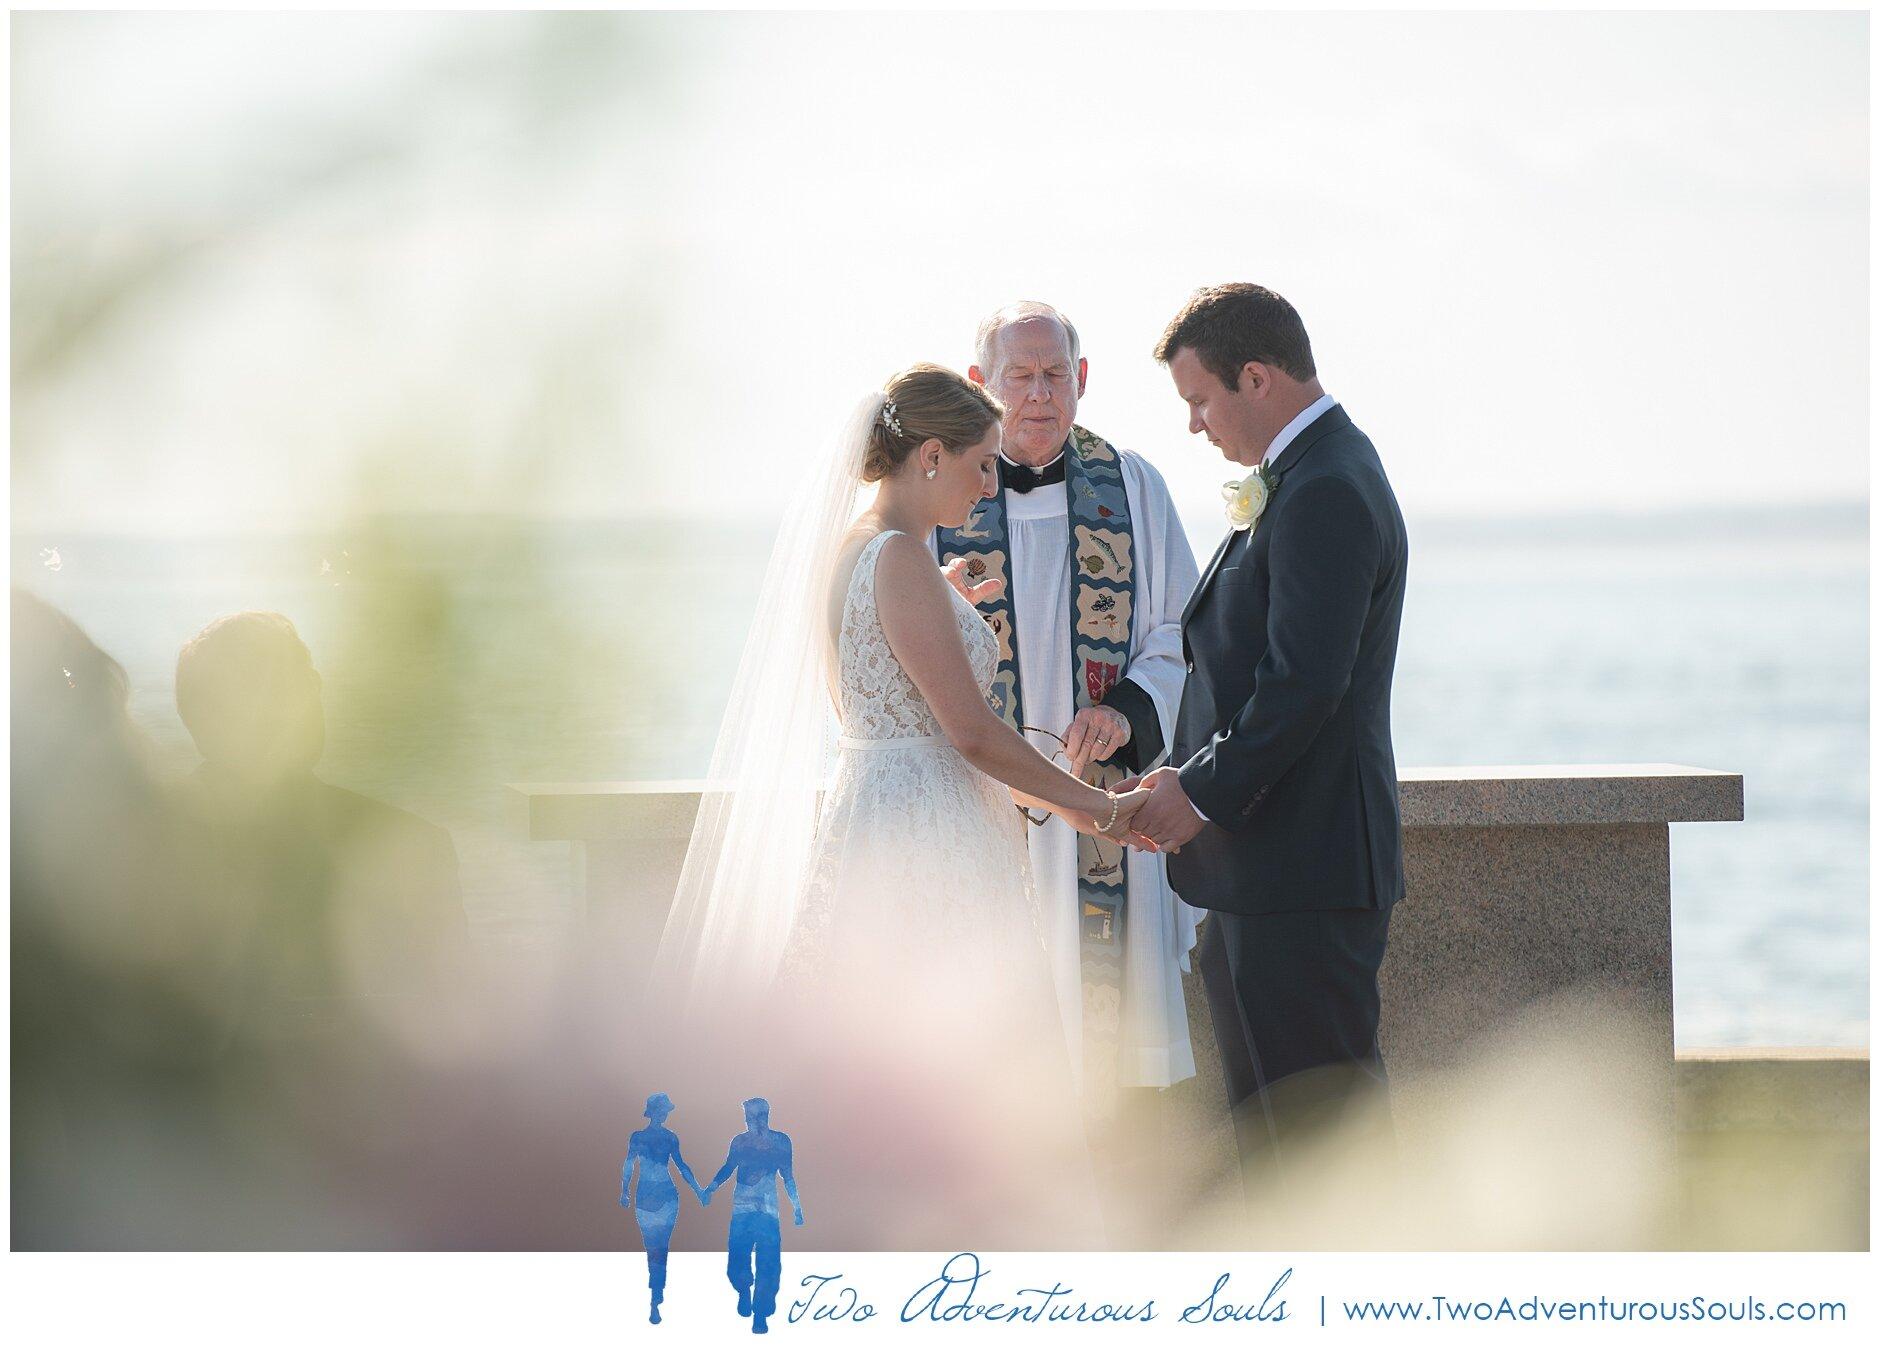 Breakwater Inn and Spa Wedding Photographers, Kennebunkport Wedding Photographers, Two Adventurous Souls- 092119_0034.jpg